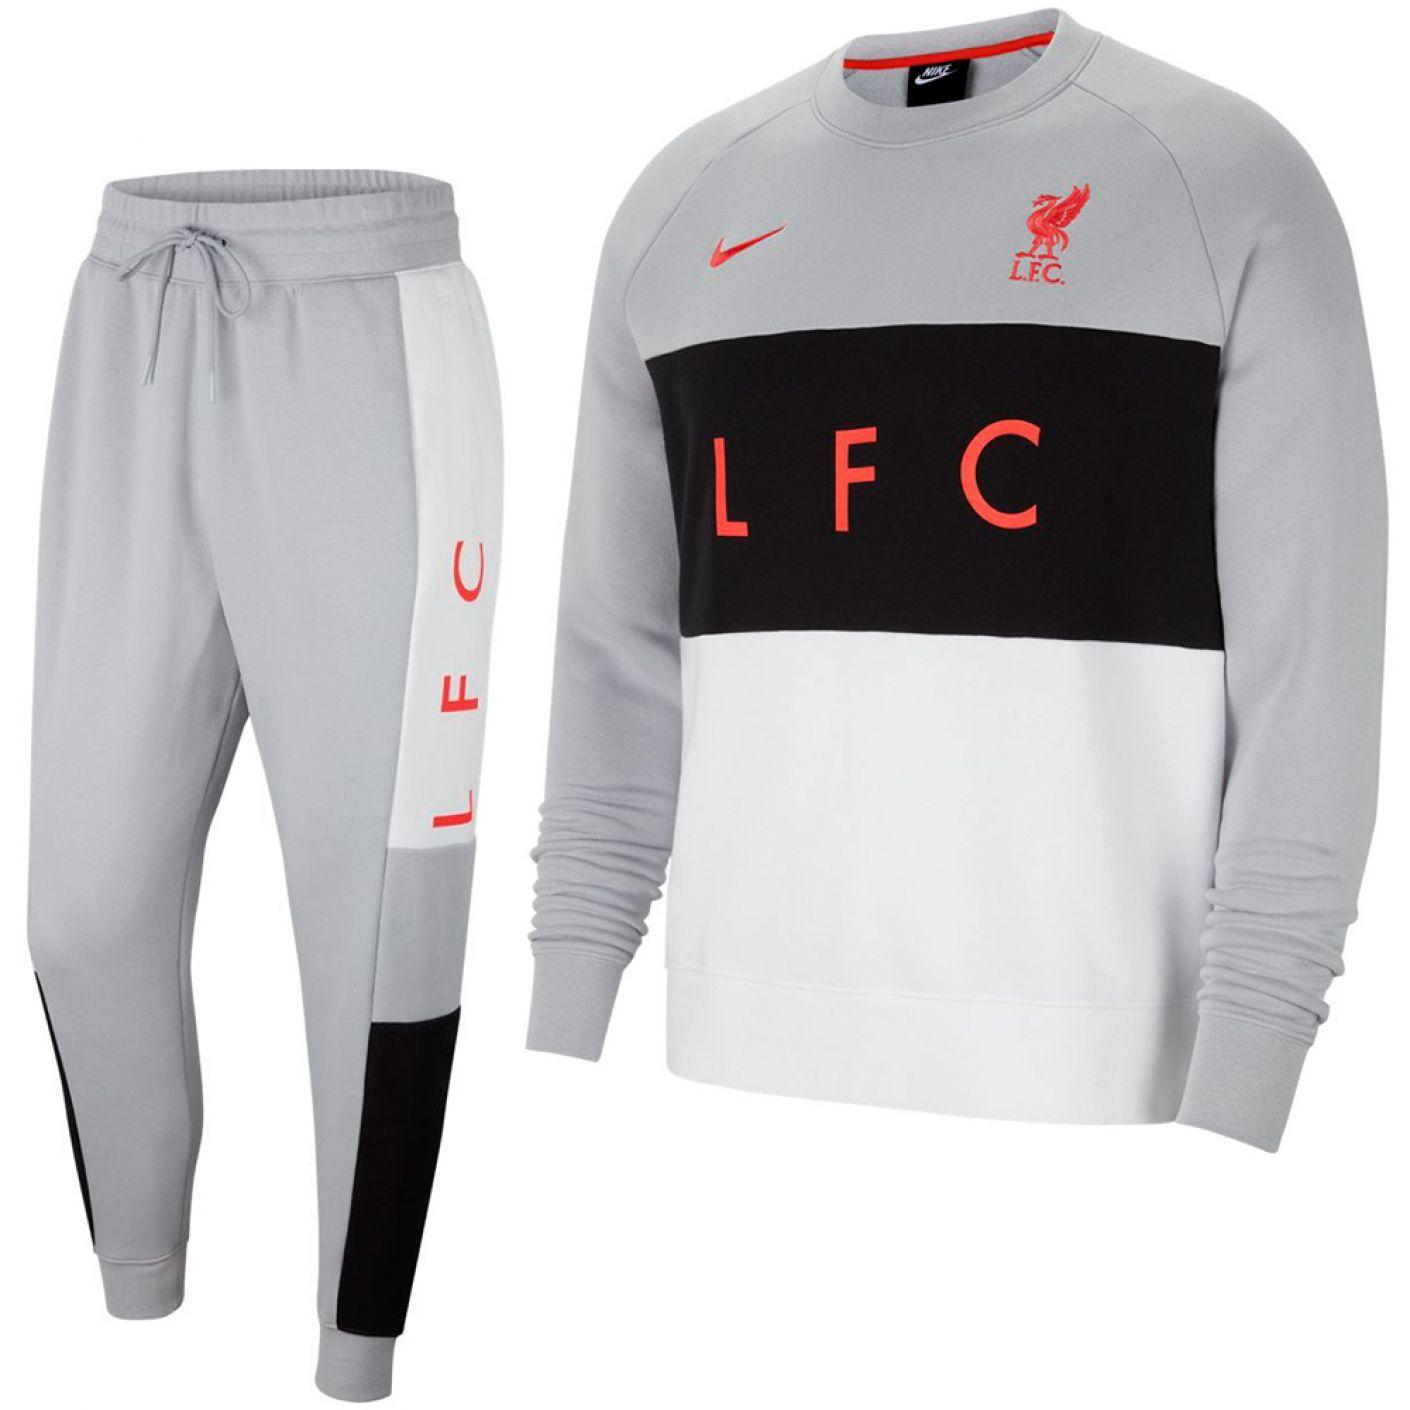 Nike Liverpool NSW Air Fleece Trainingspak 2021 Grijs Wit Zwart Rood